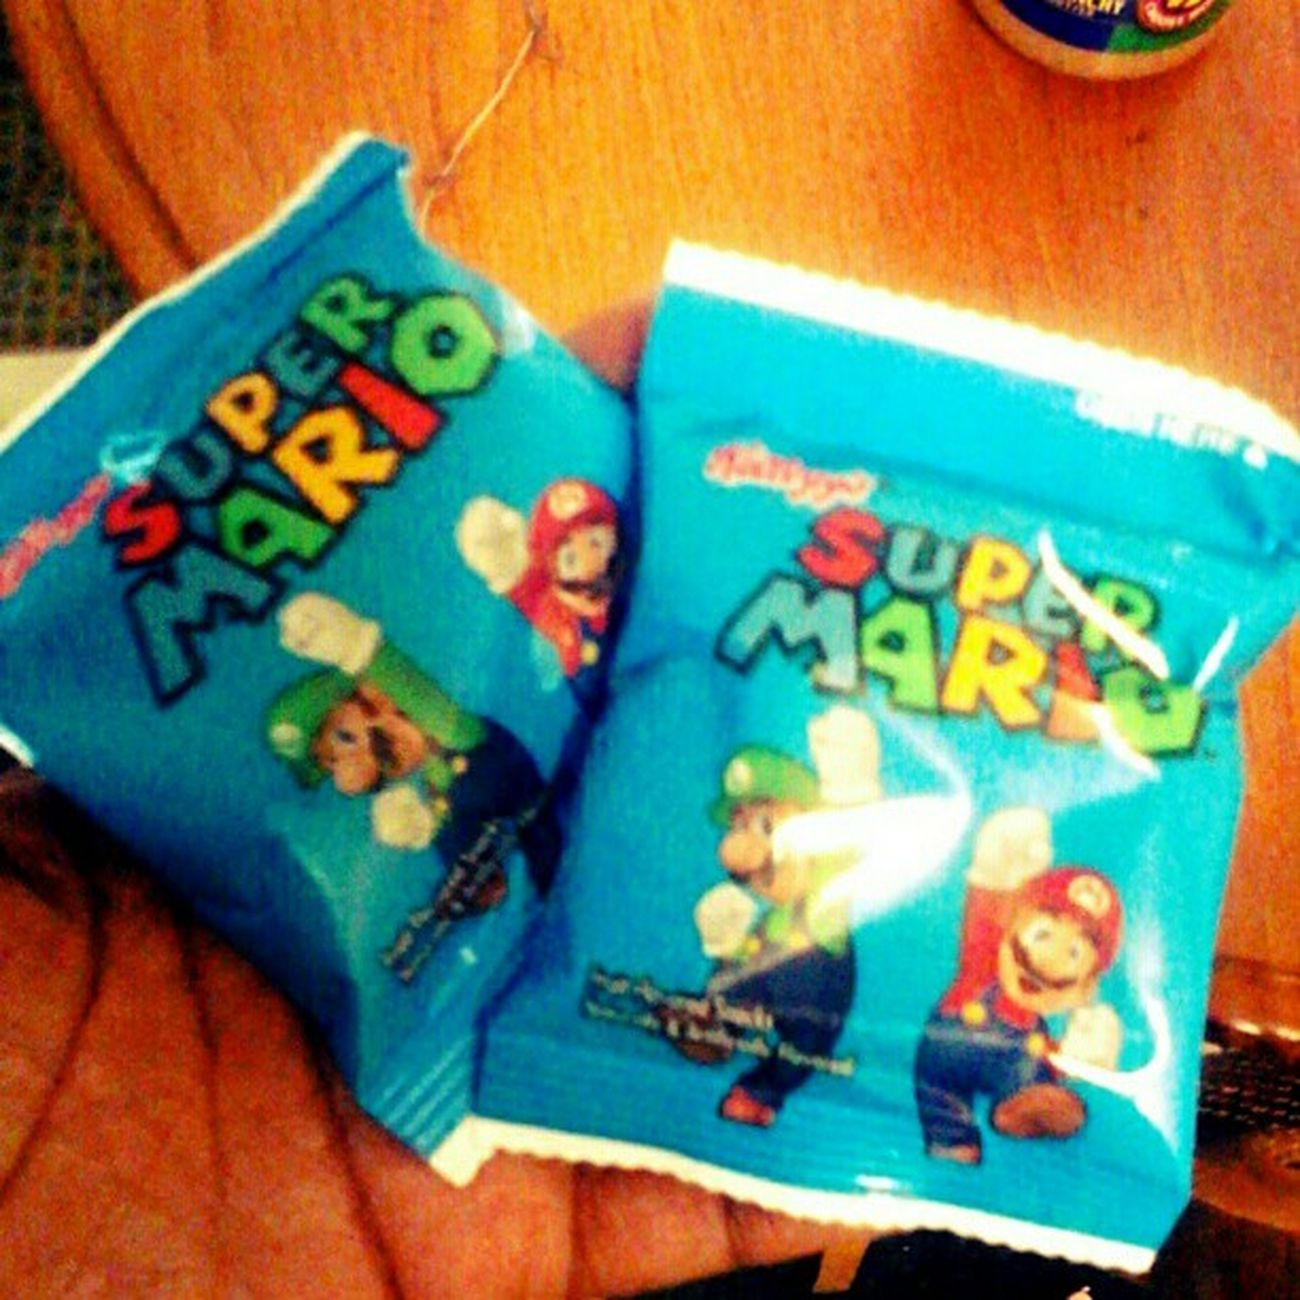 My #yummy #snack of #supermario #fruitsnacks. 70 calories each. Ninstagram Yummy Snack Nintendo Lowcarb Supermario Igersnintendo Lowfat SuperMarioBros Wtfgamersonly Lowcalorie Nintendolife Wtfgo Fruitsnacks Lowcal